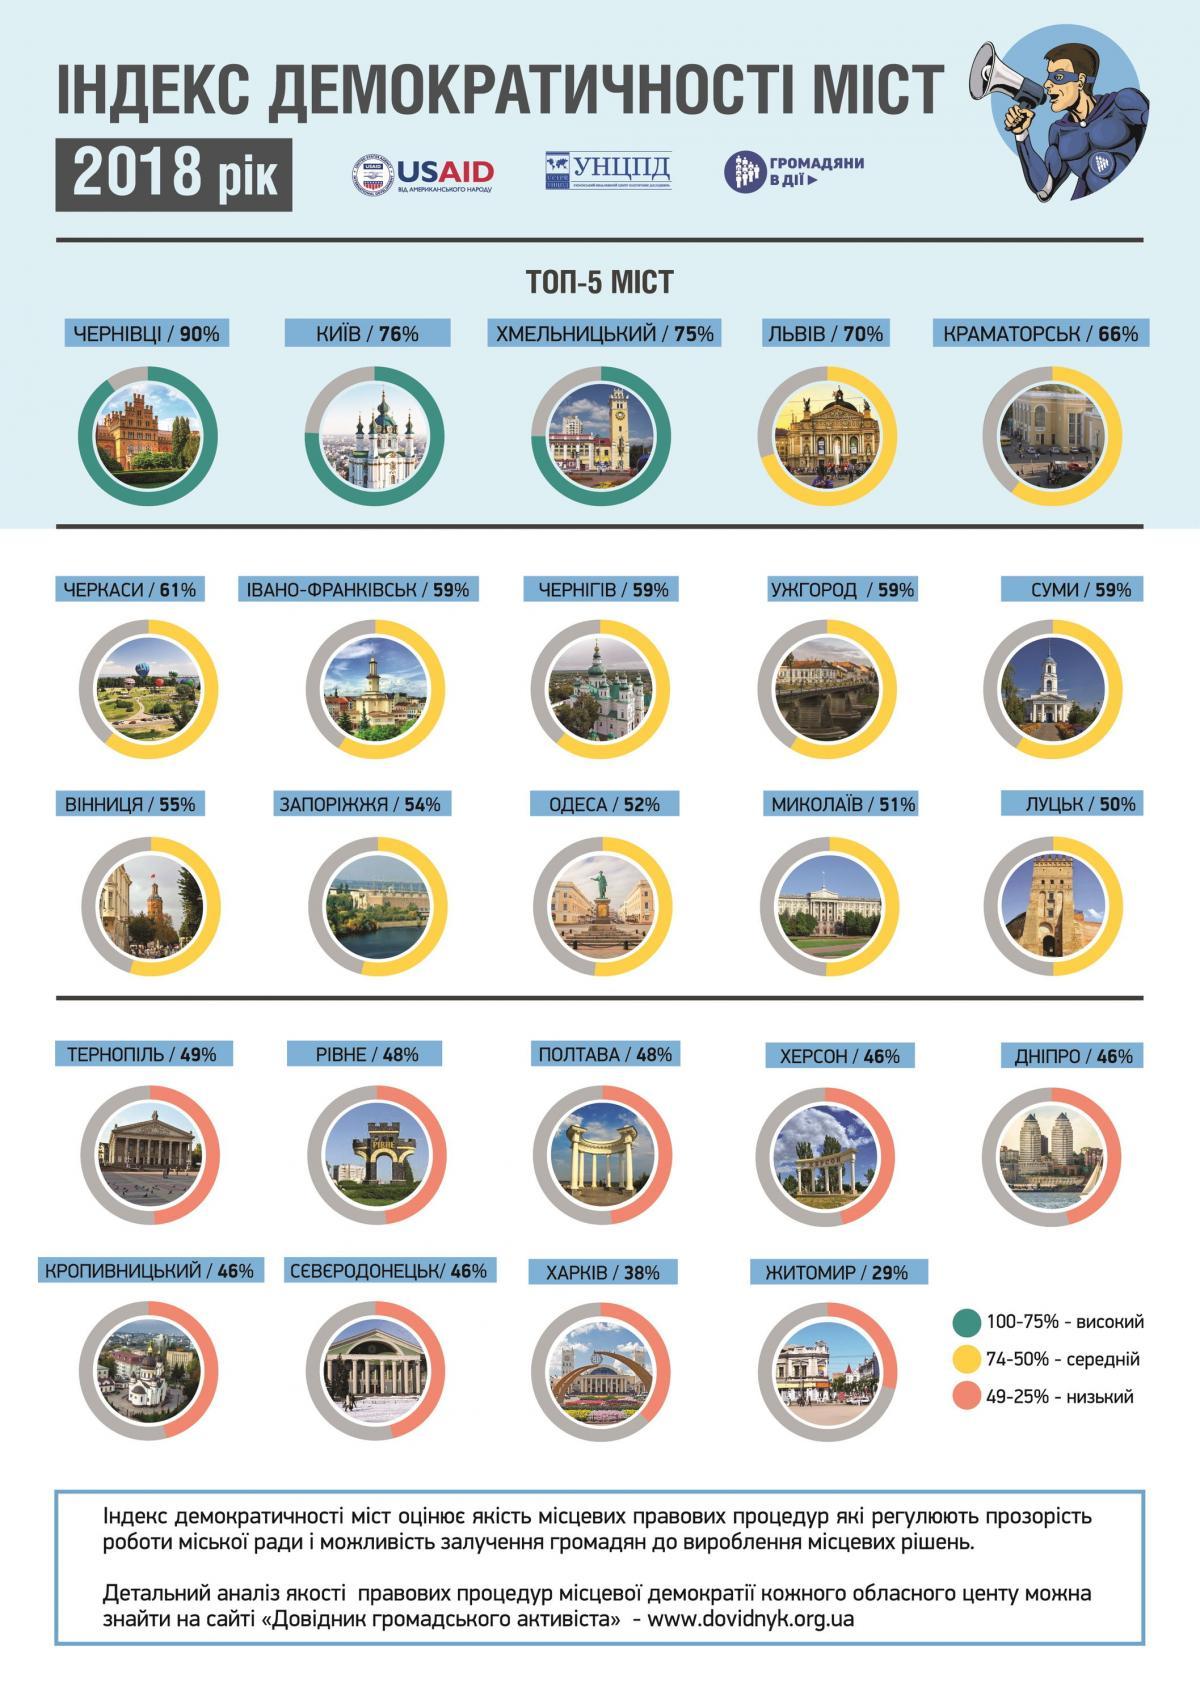 Индекс демократичности городов / фото dovidnyk.org.ua